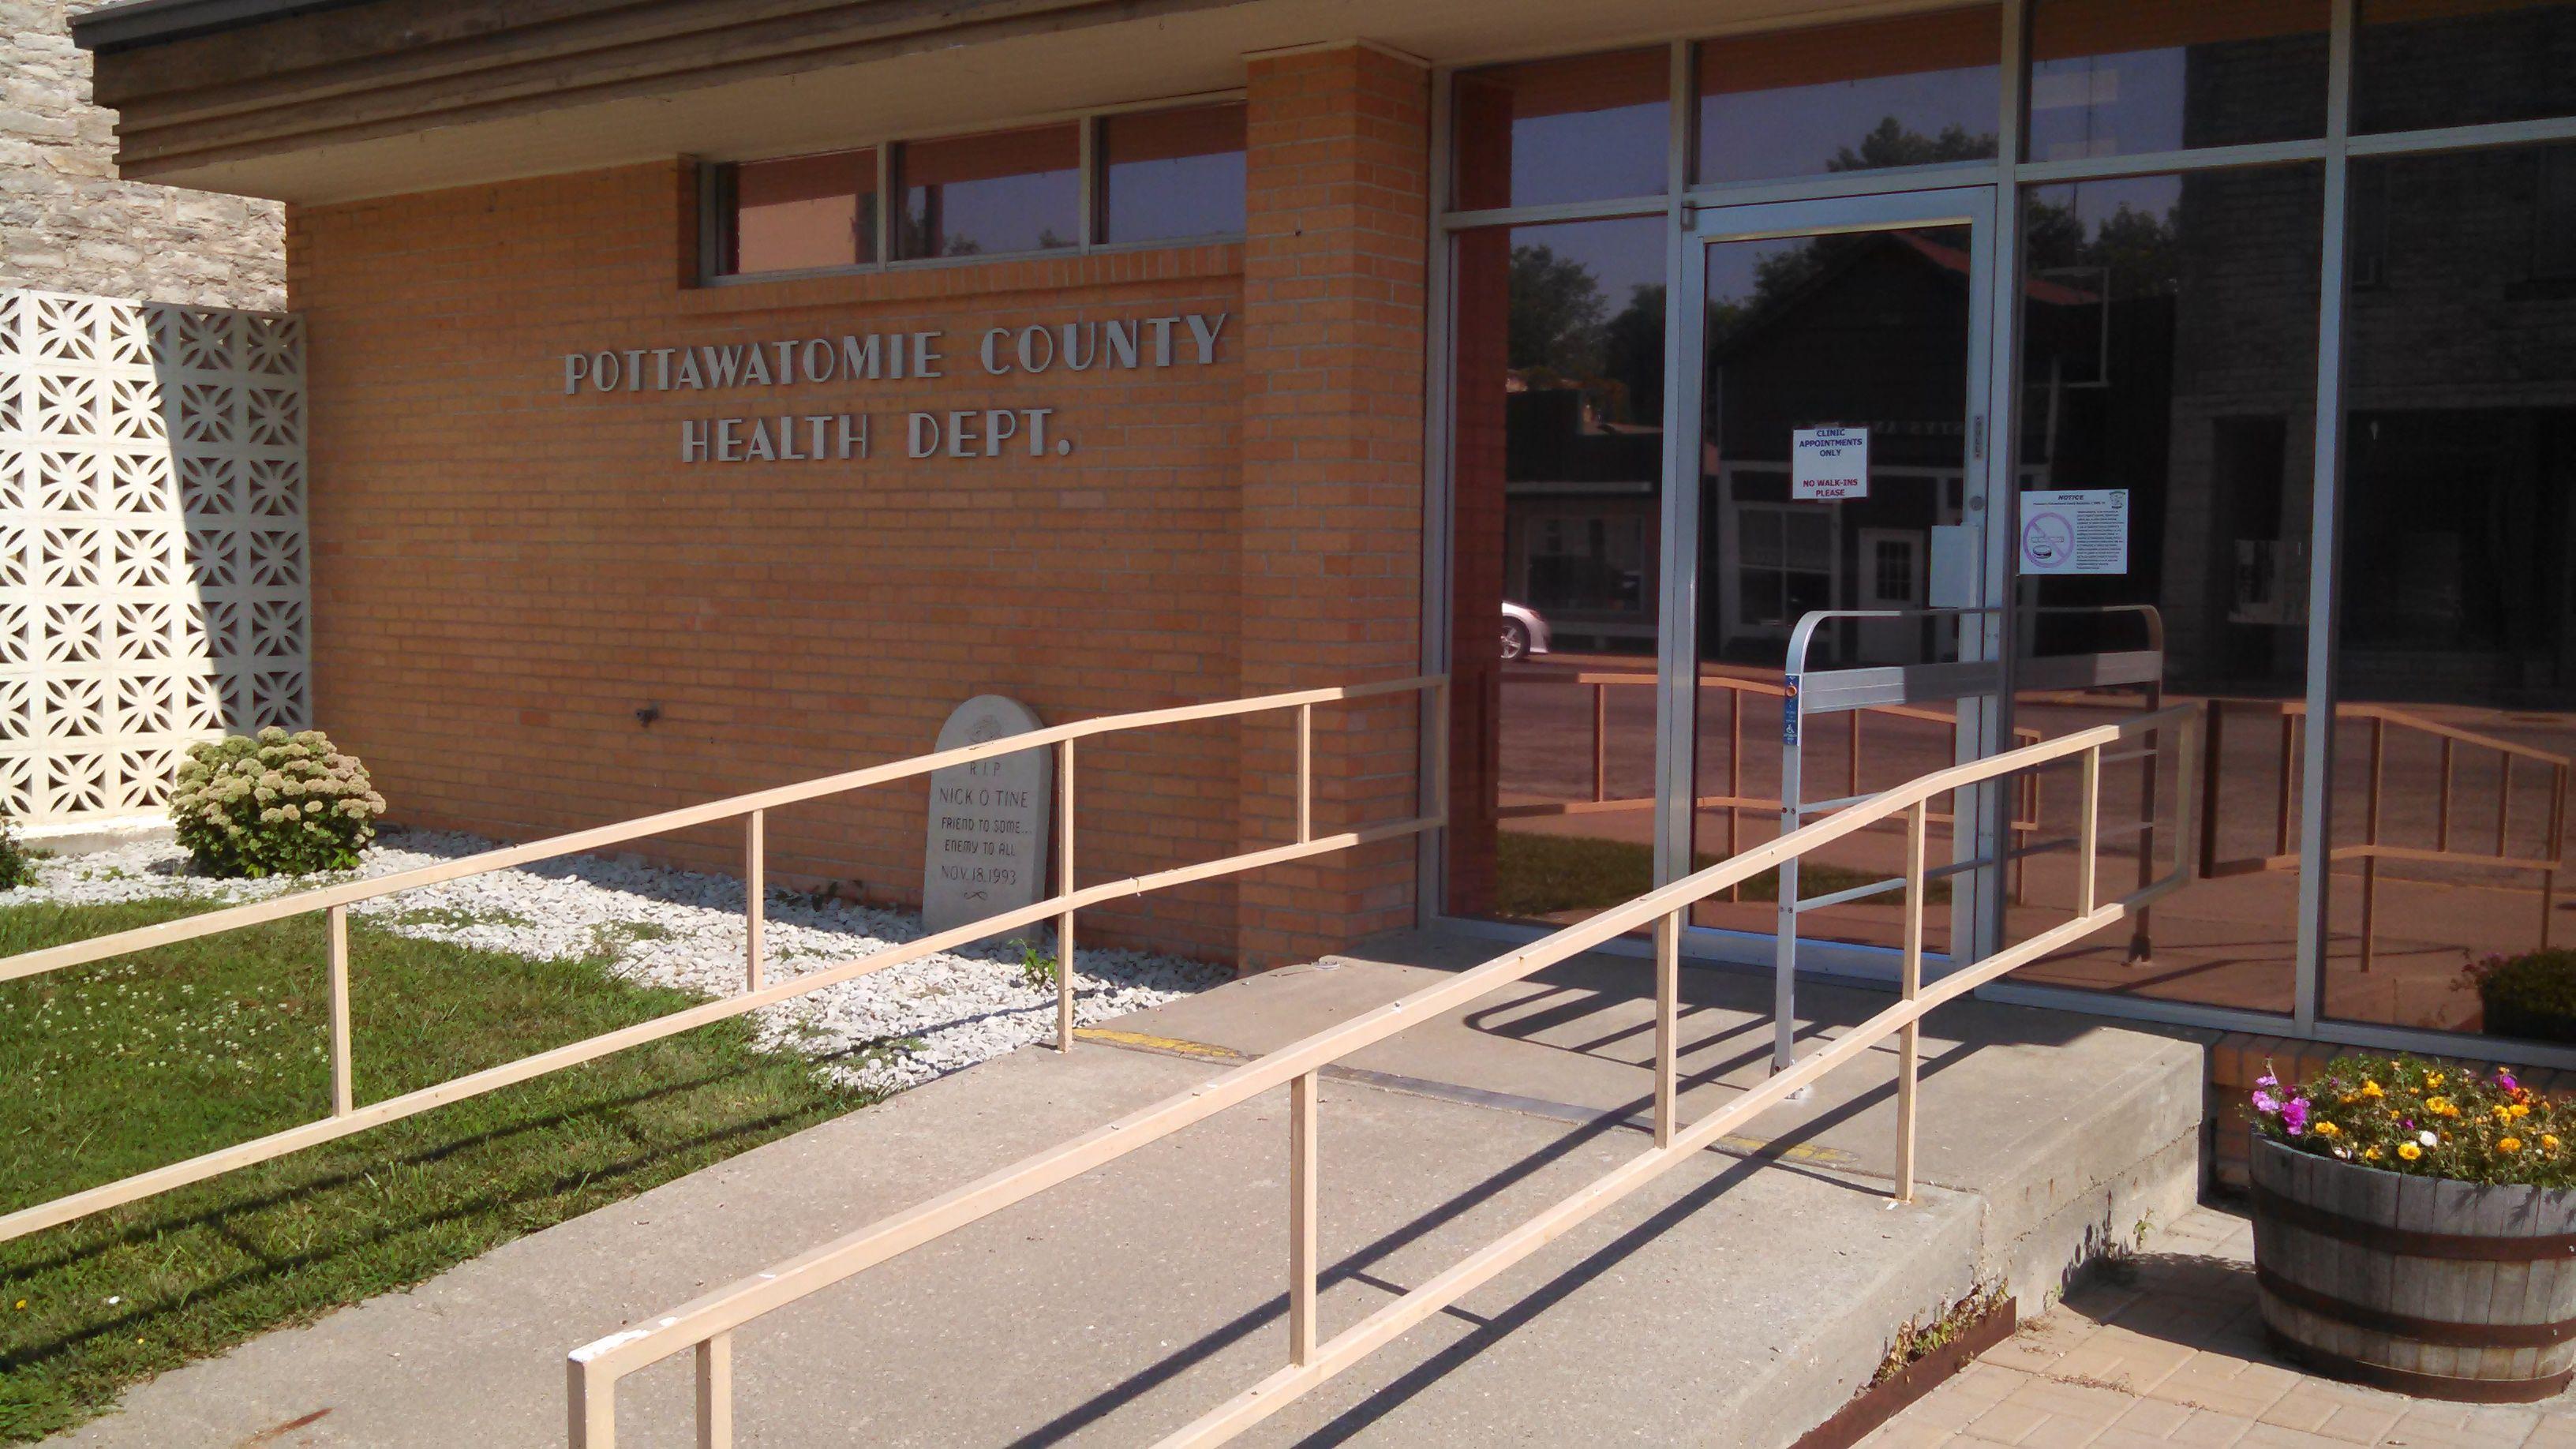 Pottawatomie County Health Department